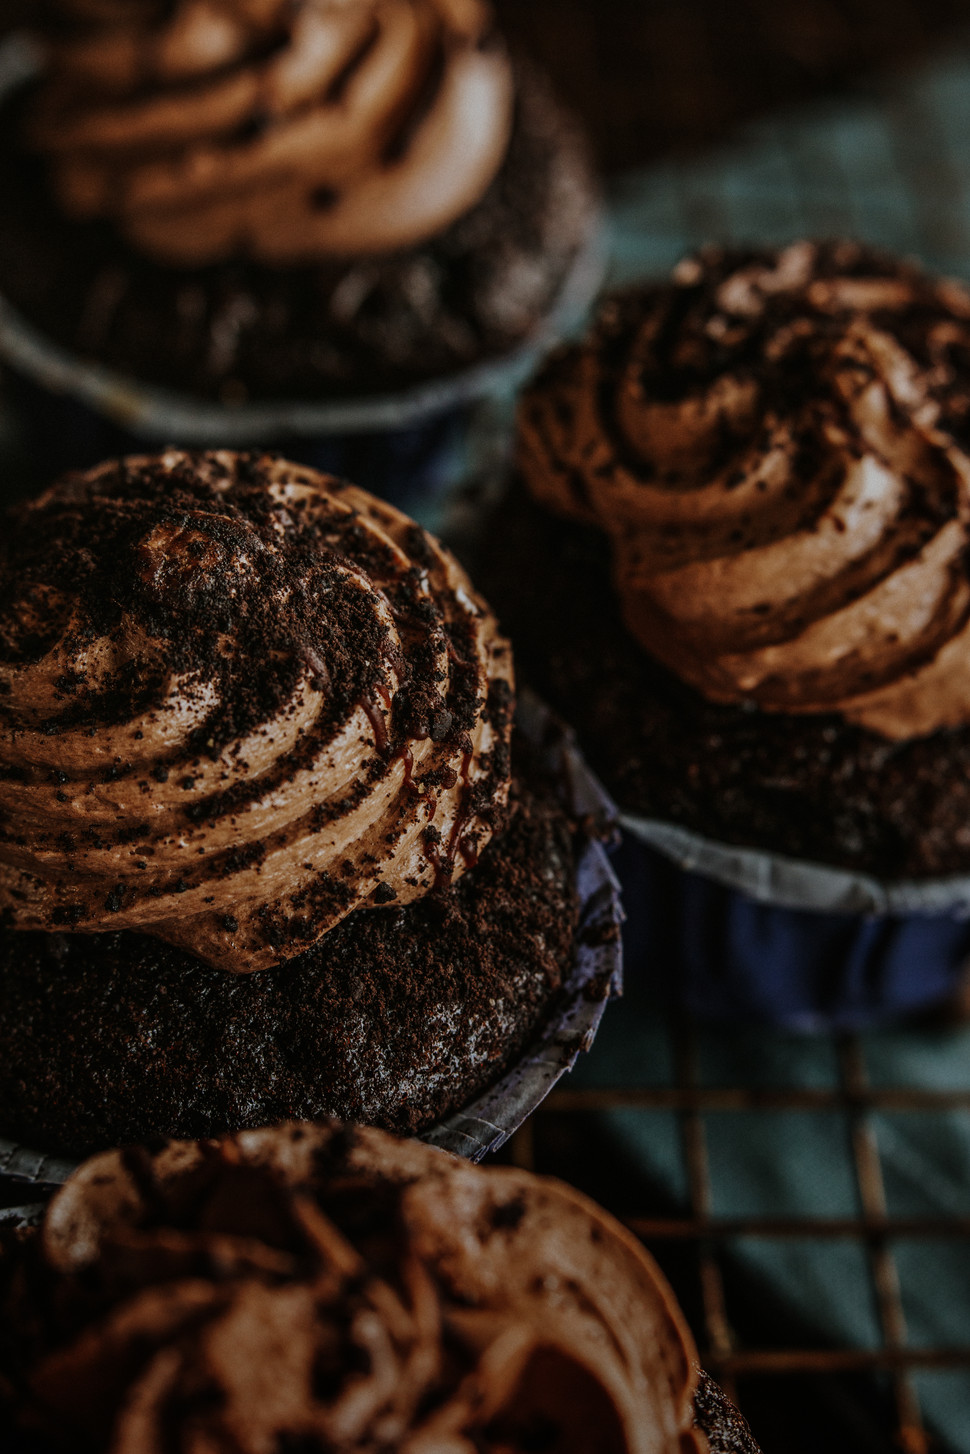 Hollie_Jeakins_Food_Photograhy_Cupcakes.jpg